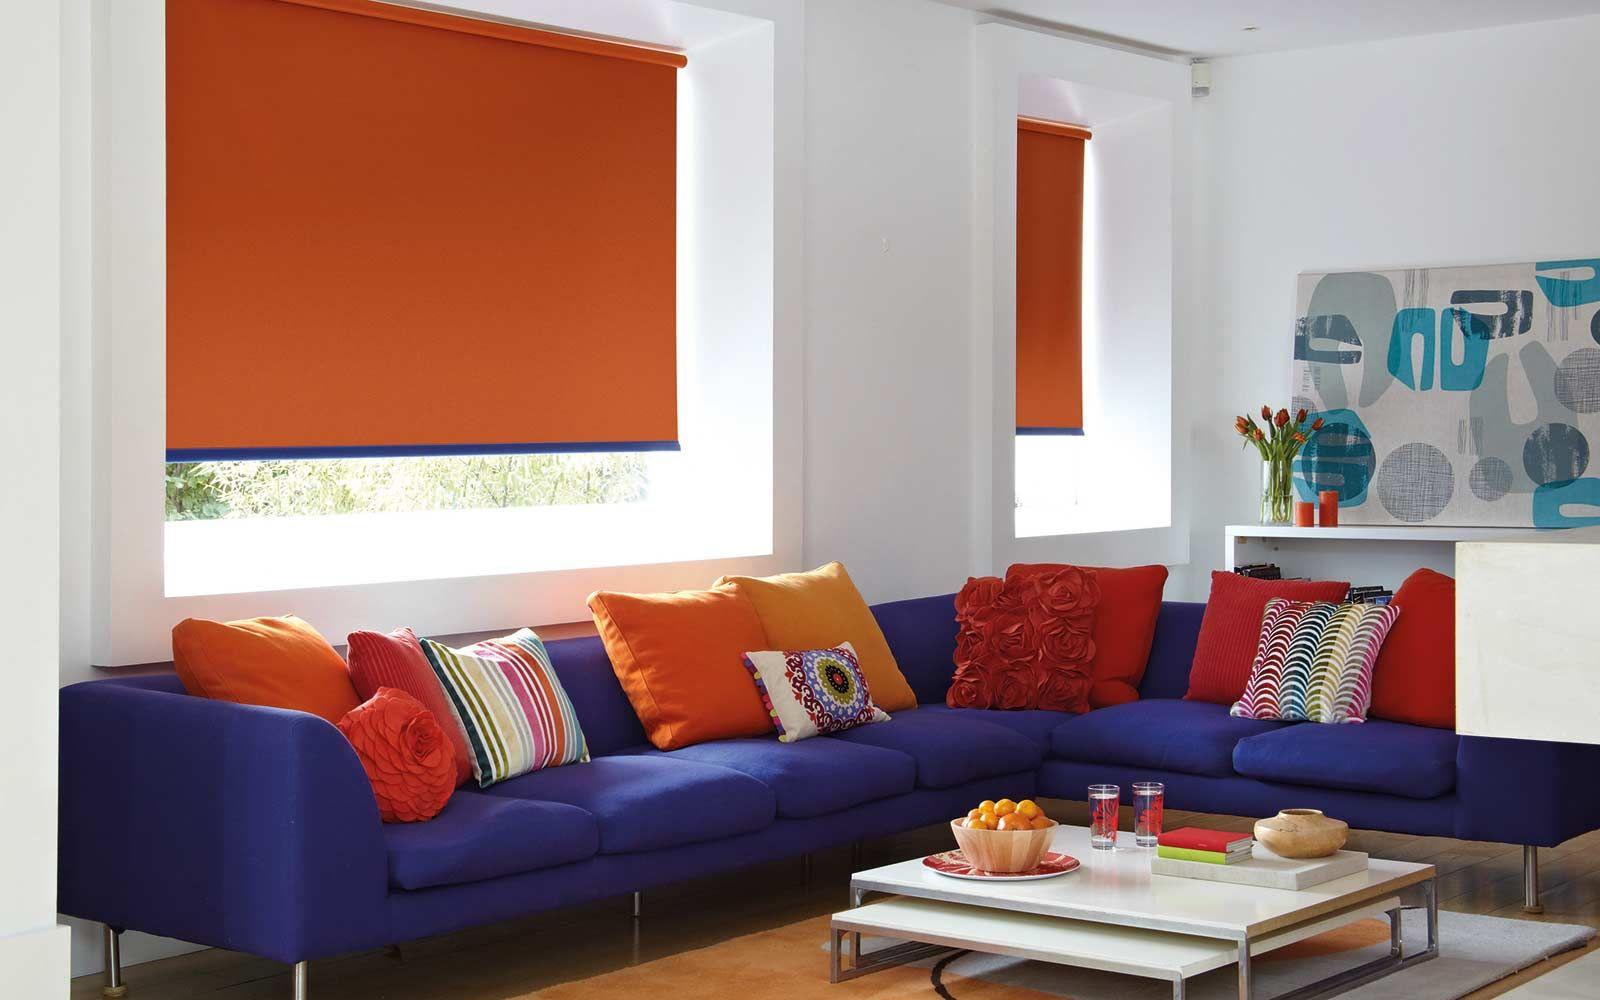 Roller Badezimmermöbel ~ Protecting interior room from sunshine by installing roller blinds